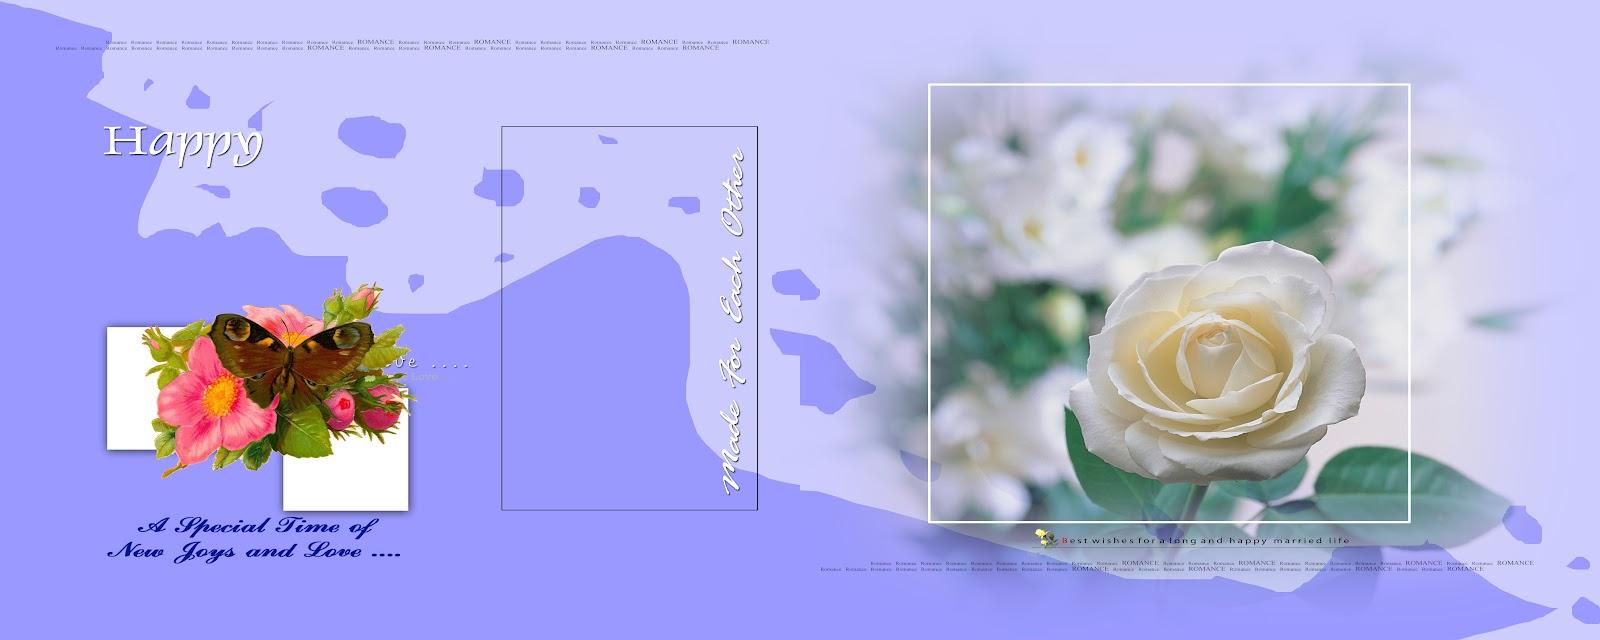 Karizma Background Hd Shan Studio